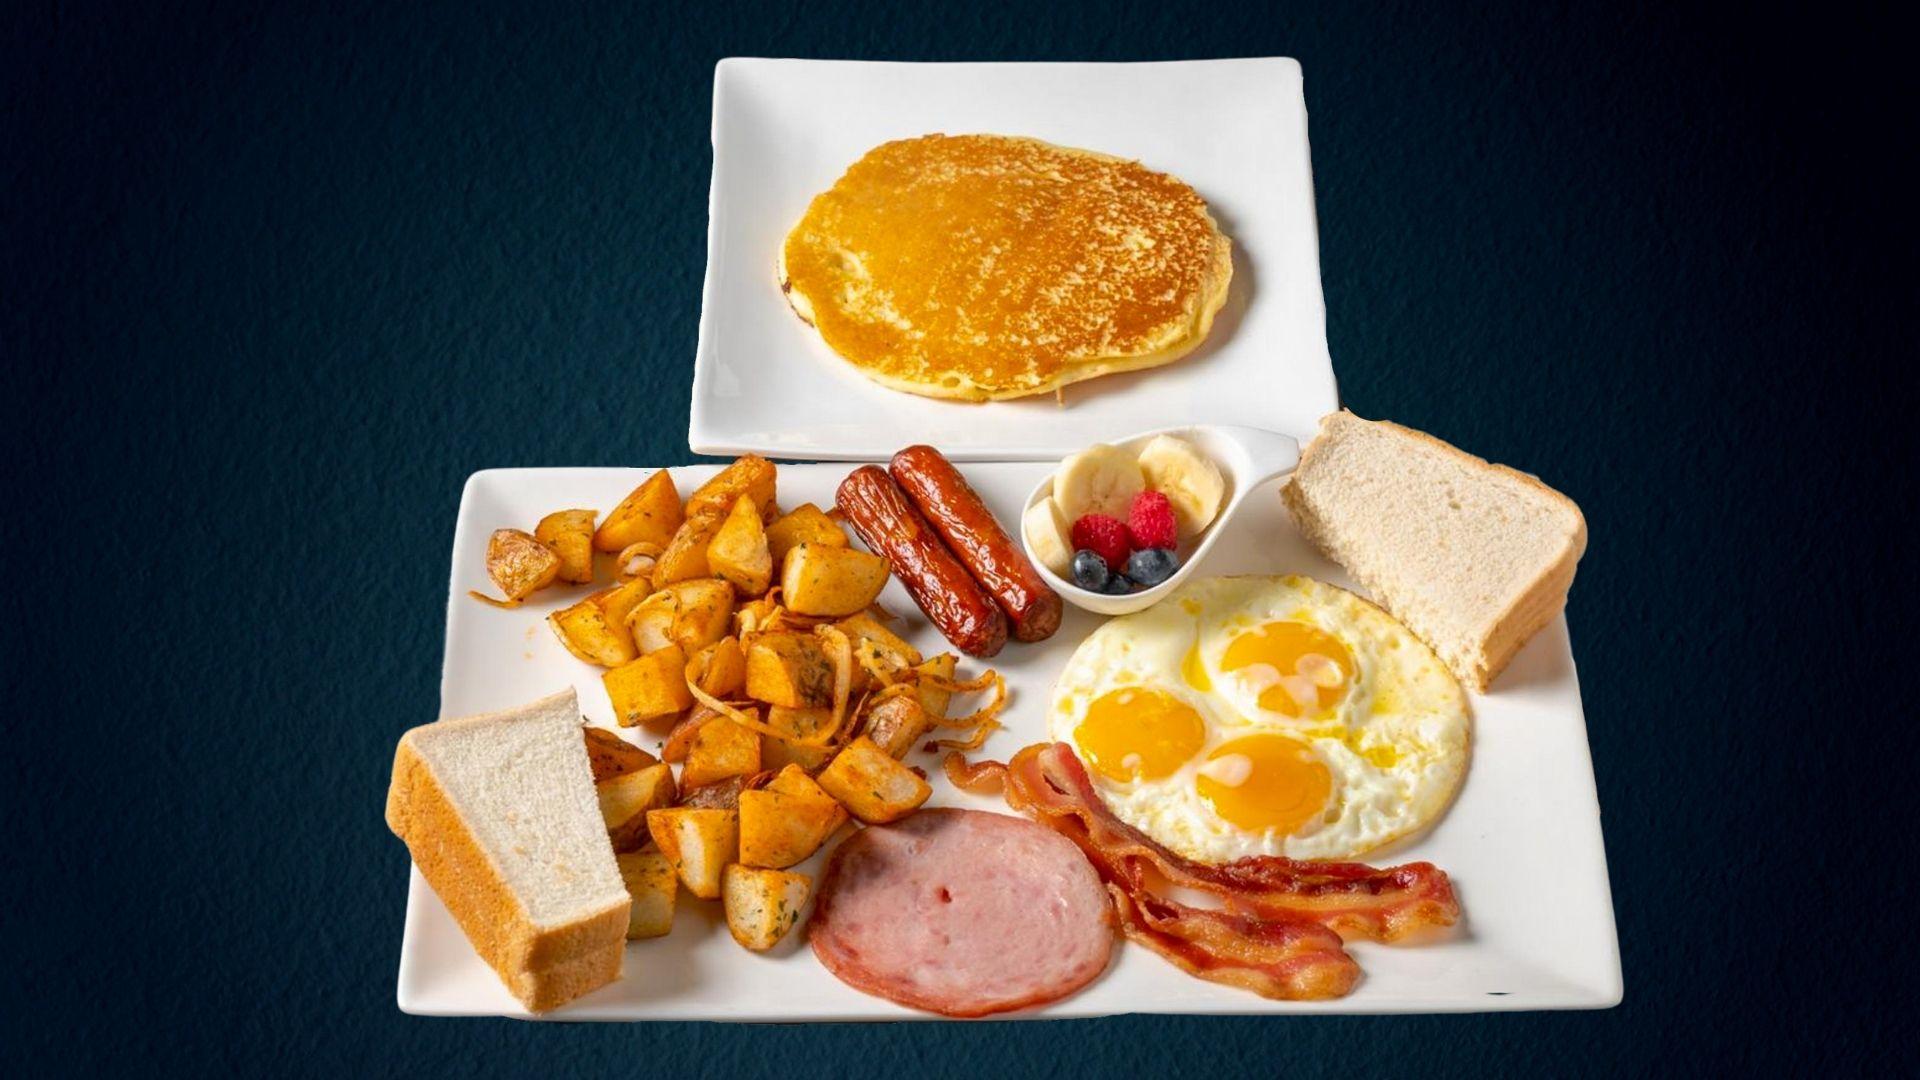 Pier53 - Captains Plate Breakfast